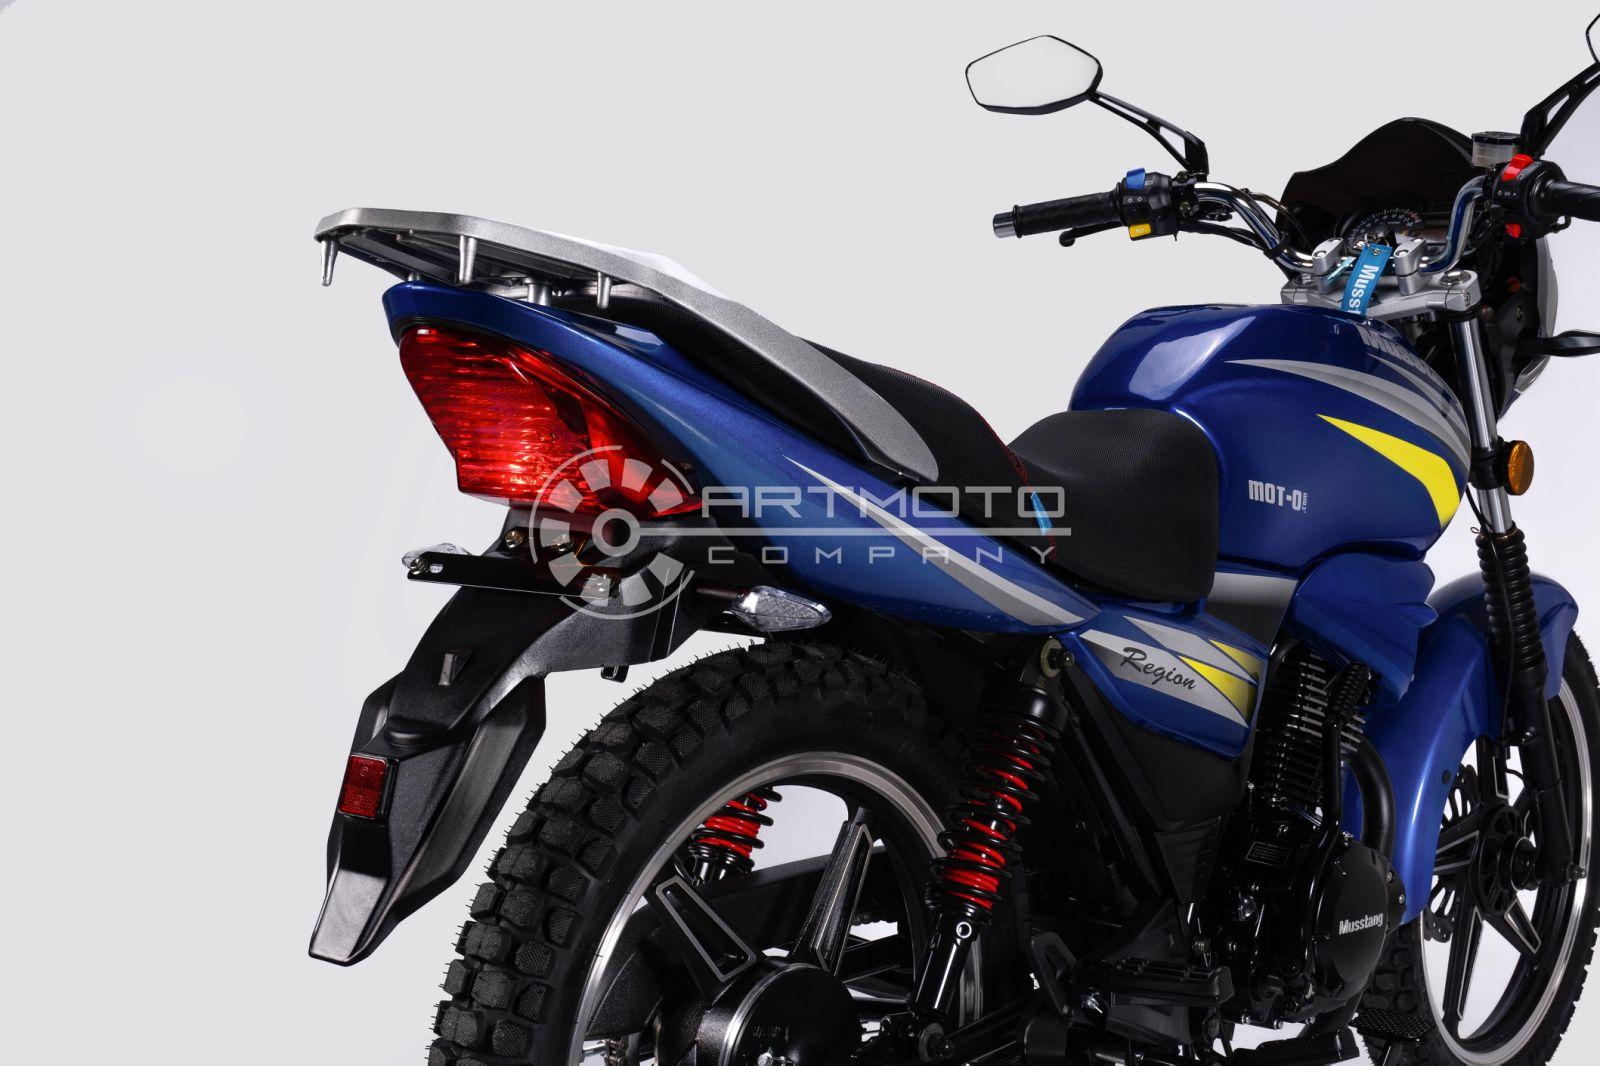 МОТОЦИКЛ MUSSTANG Region MT150  Артмото - купить квадроцикл в украине и харькове, мотоцикл, снегоход, скутер, мопед, электромобиль